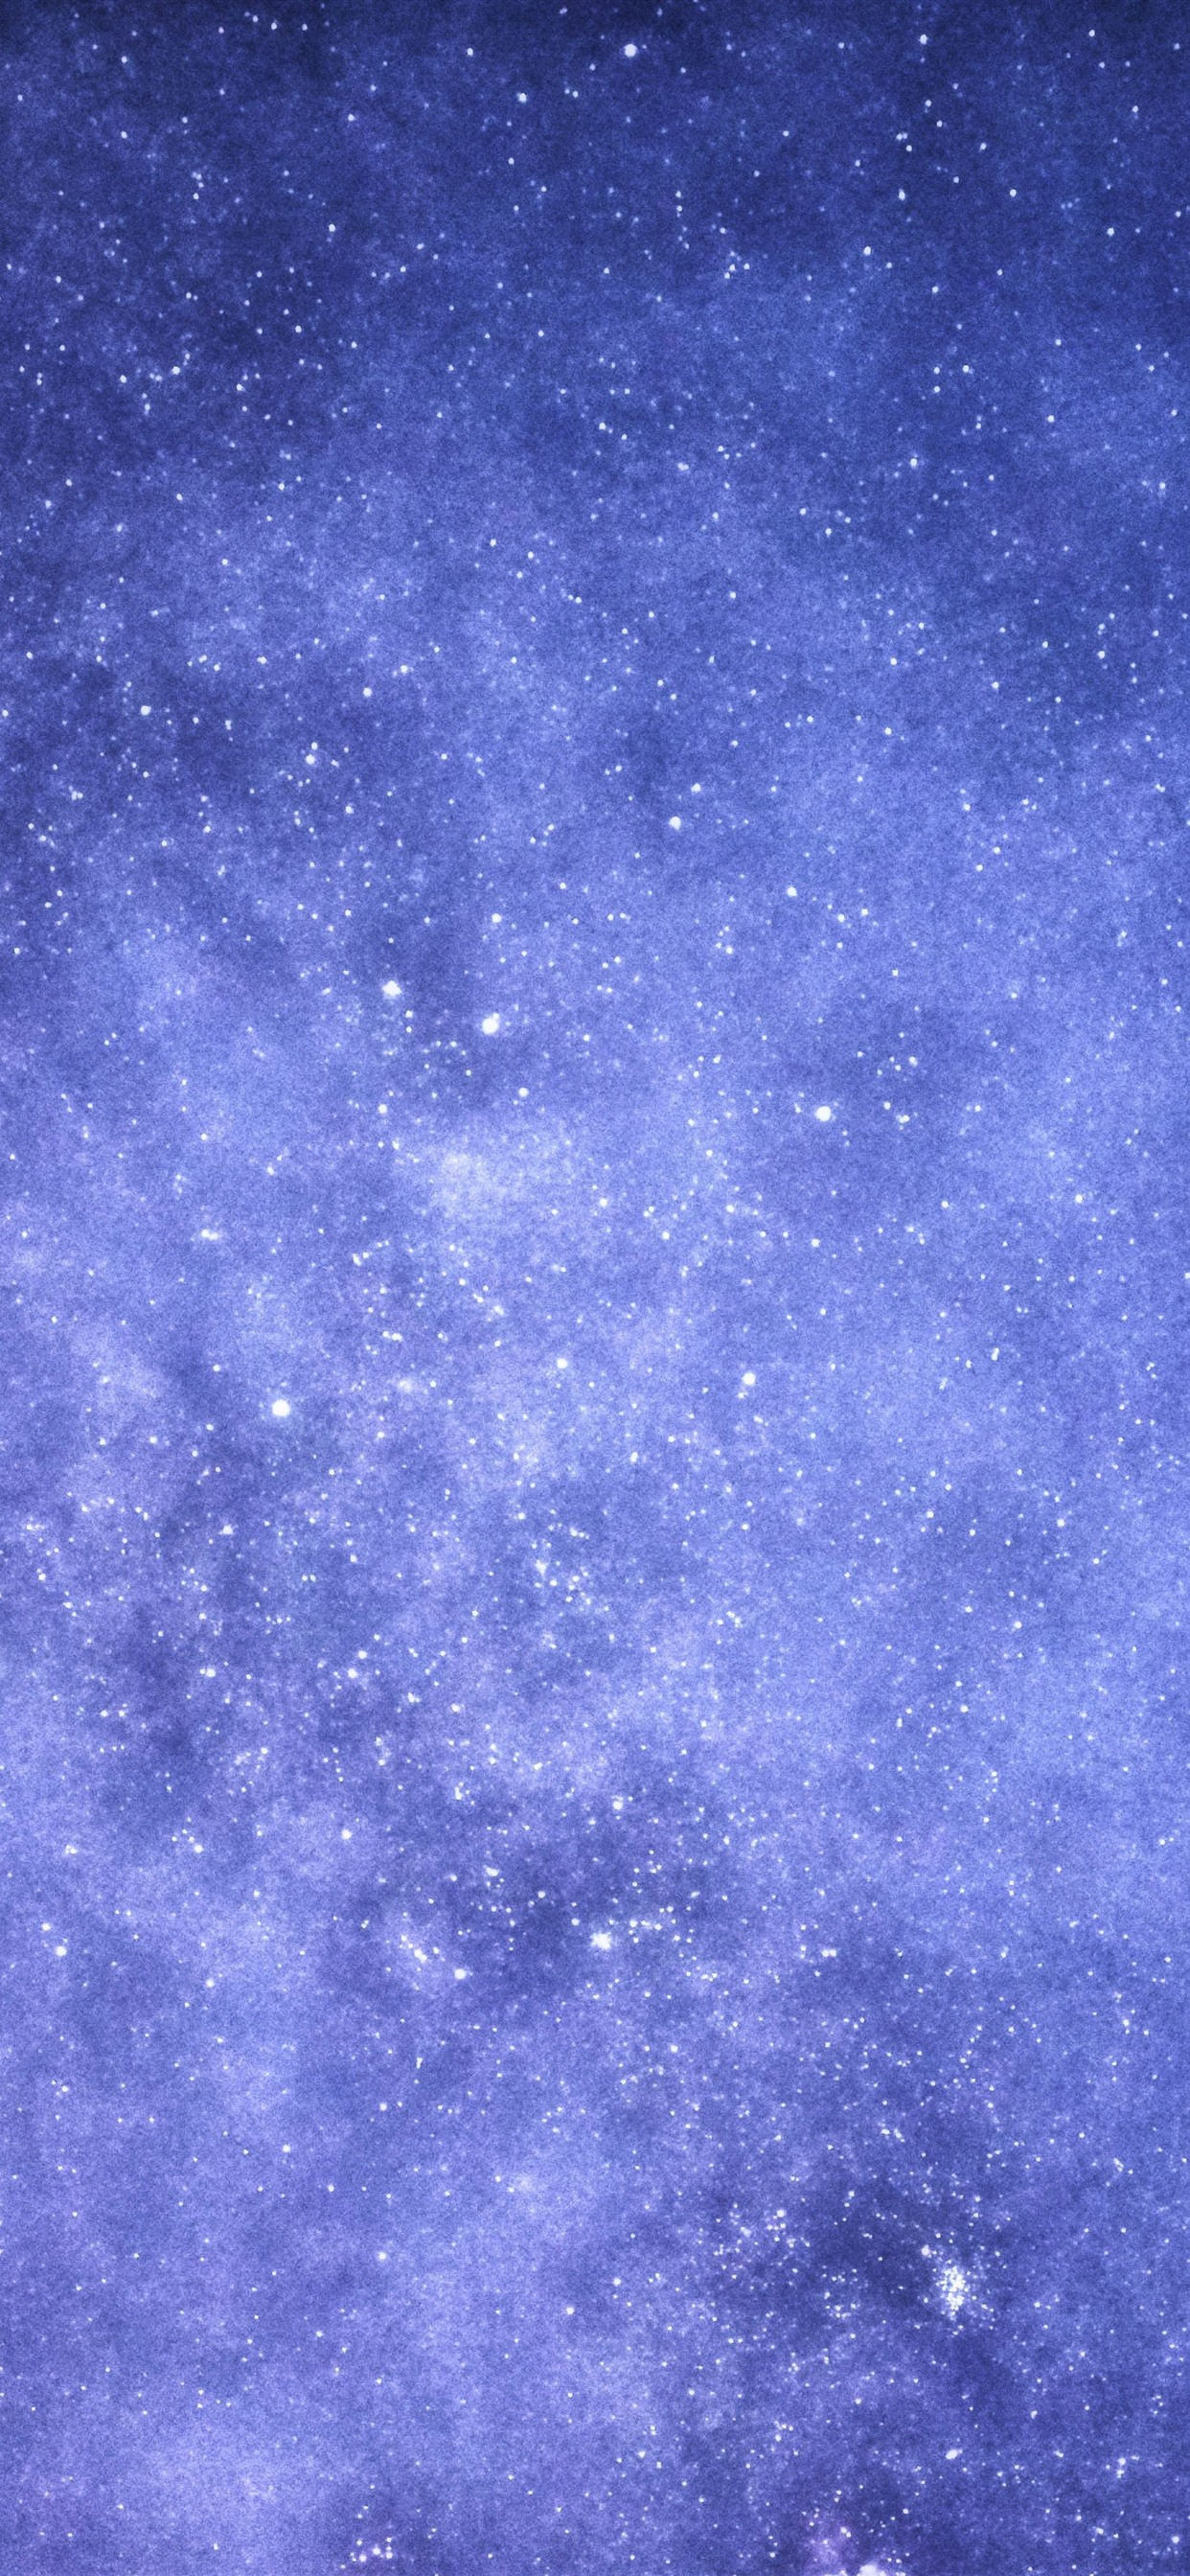 Beautiful starry, sky 1242x2688 iPhone XS Max wallpaper